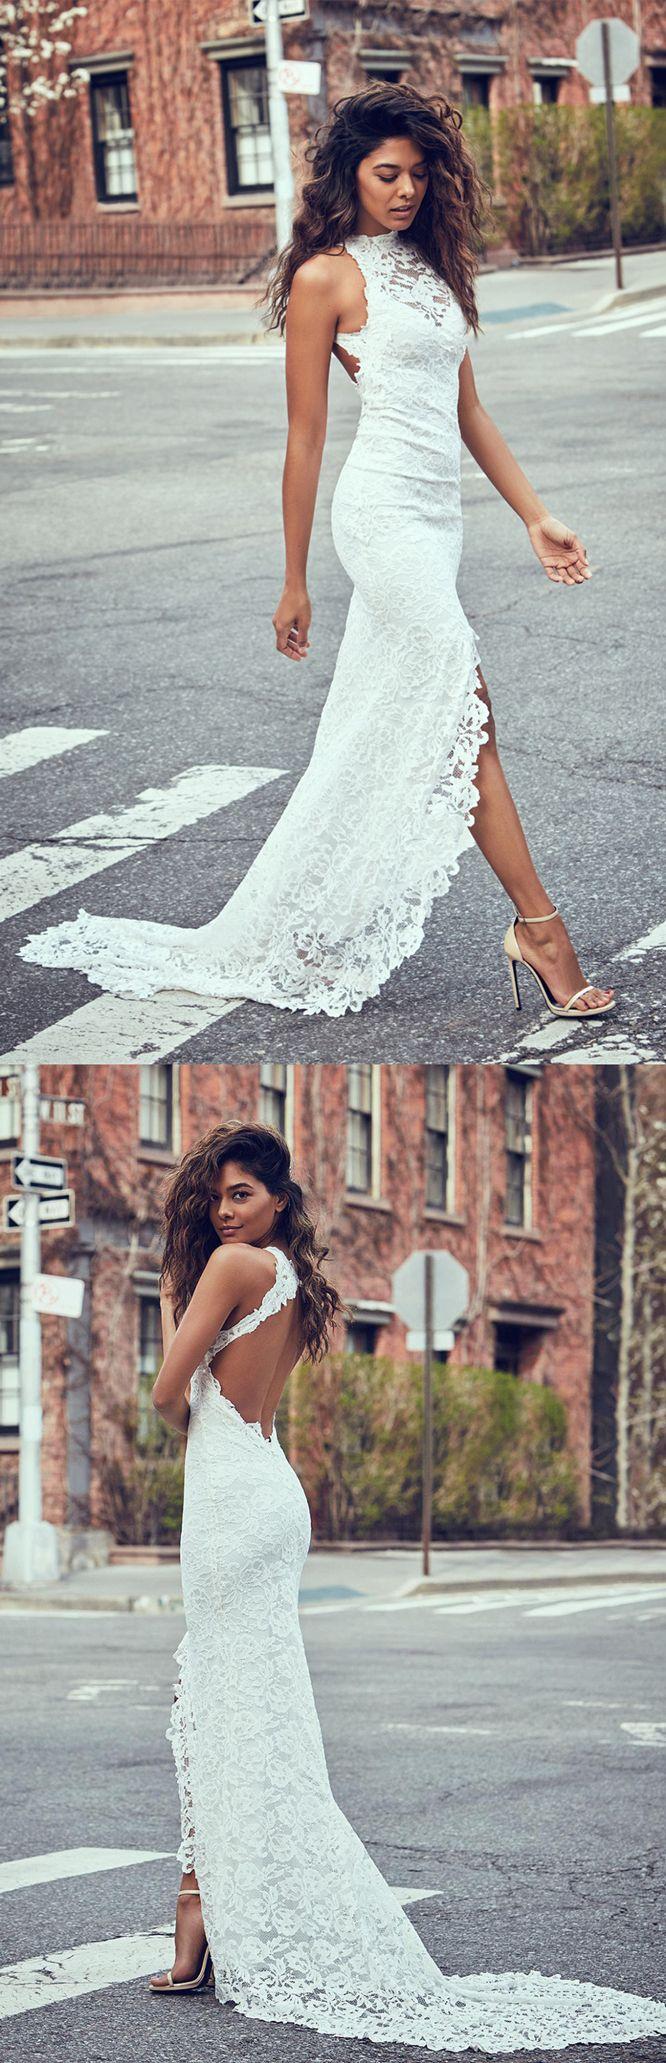 mermaid lace wedding dresses,open back long bridal gowns, simple split wedding dress